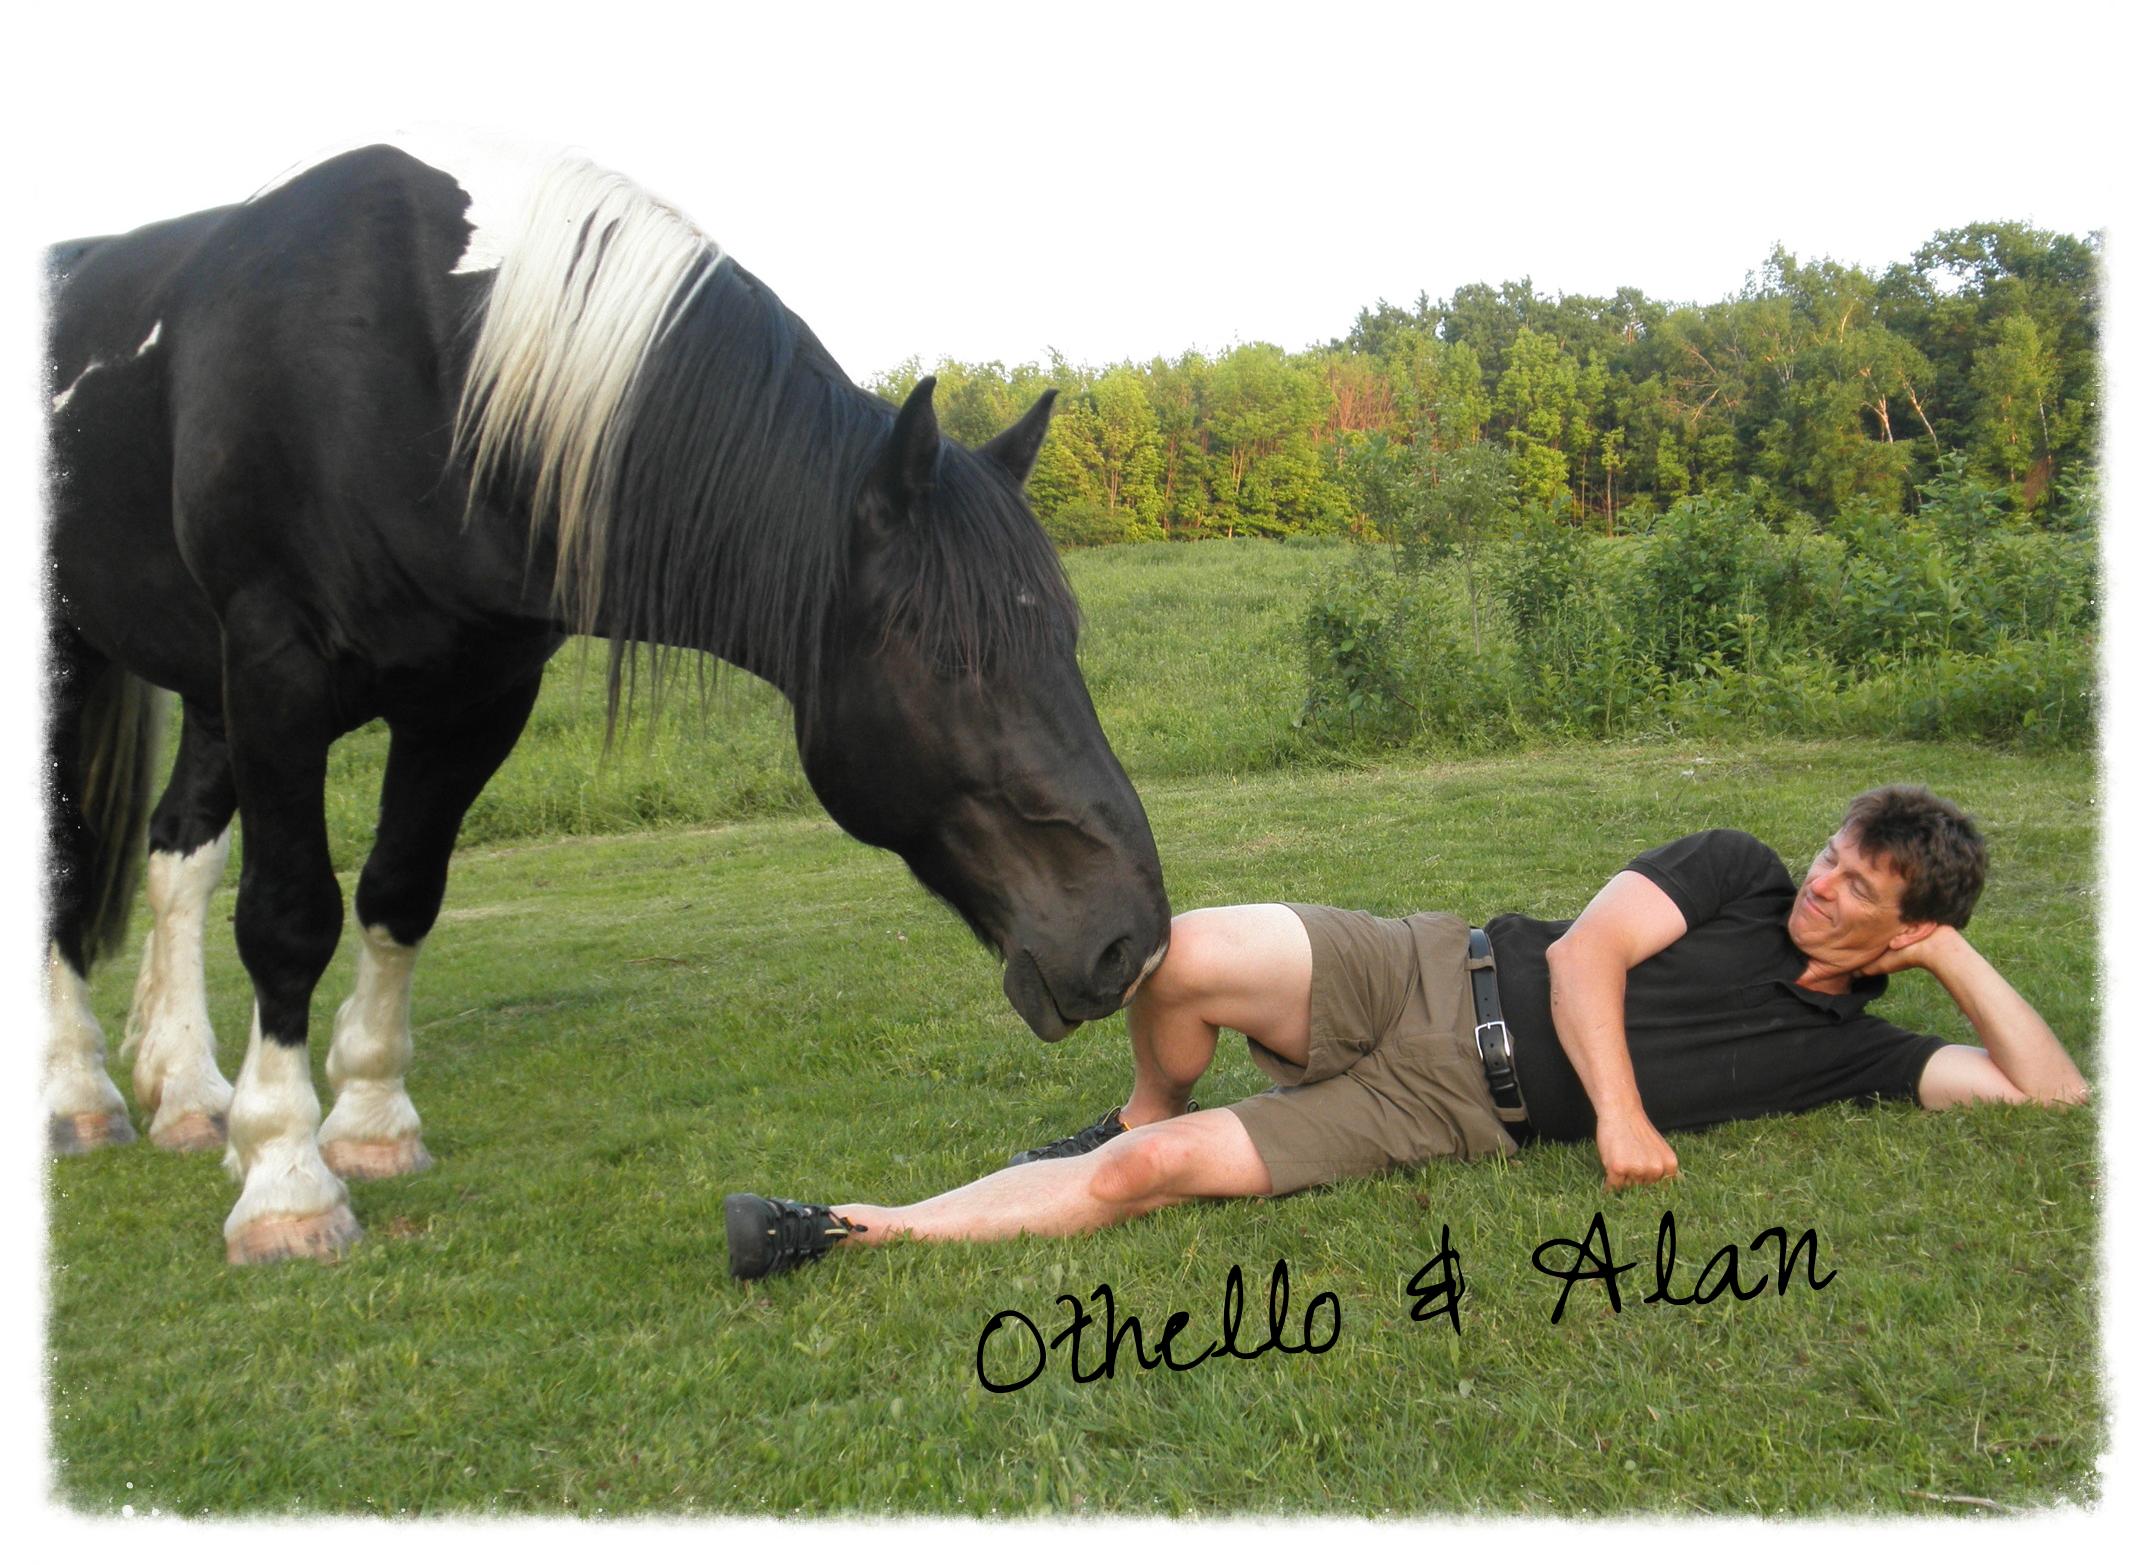 Alan with Lakota's brother Othello